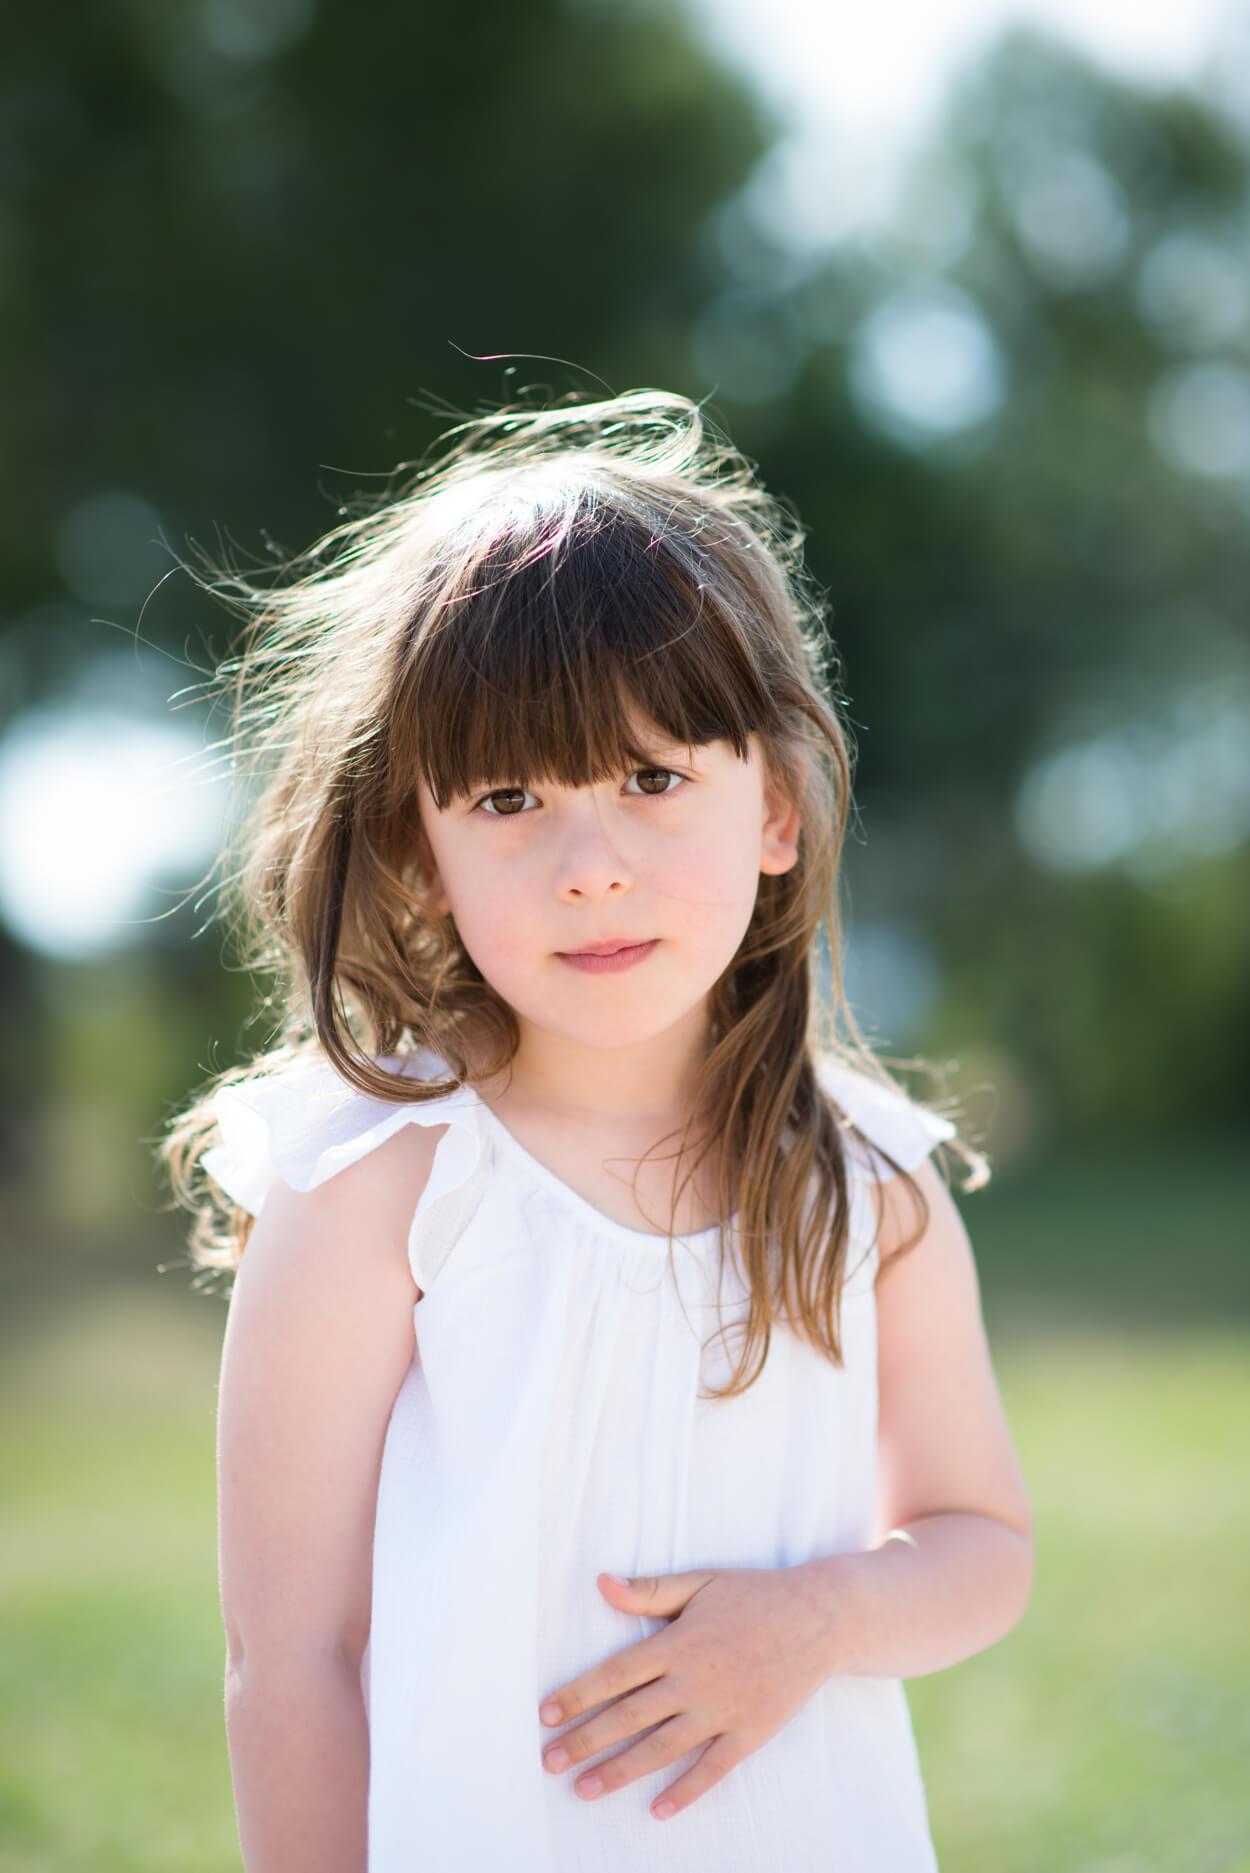 children kids portrait girl looking st camrea sun in hair natural light